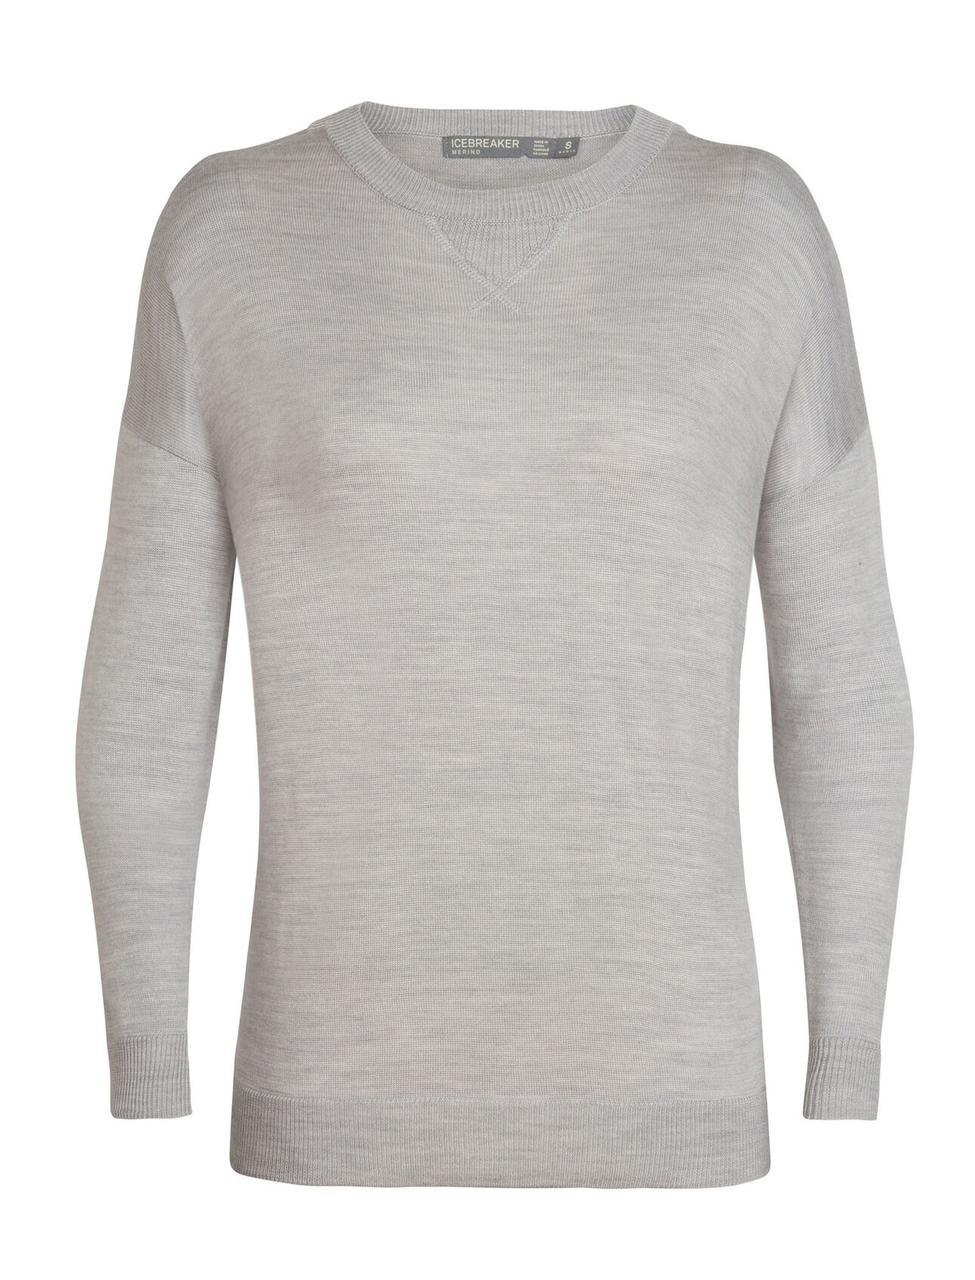 Светр жіночий Icebreaker Nova Sweater Sweatshirt